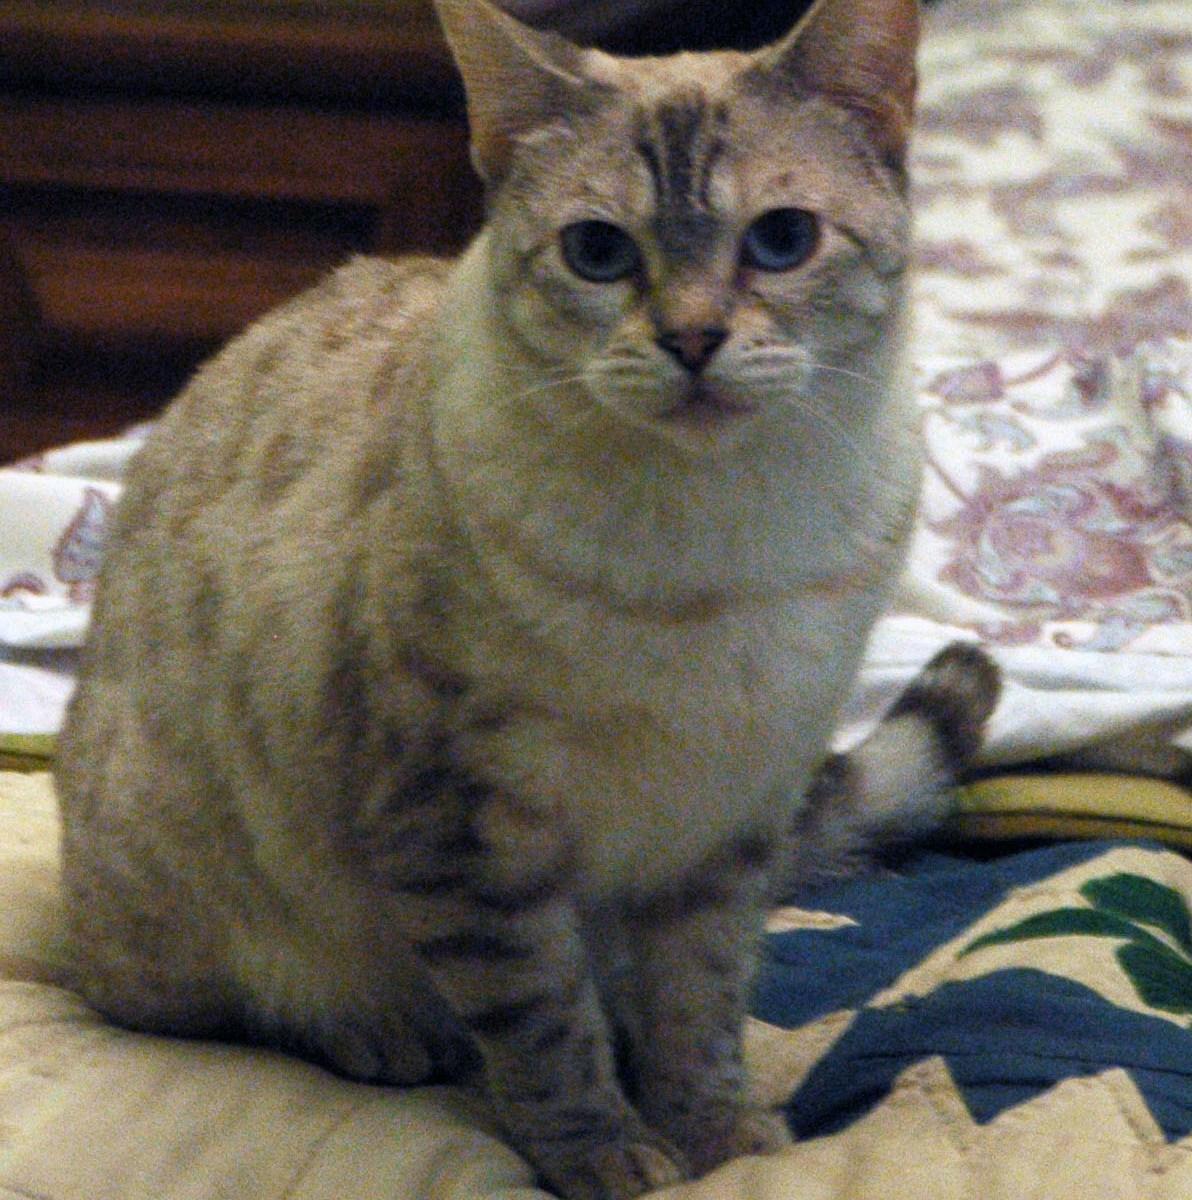 Bagheera the Diabetic Cat's Visitor Marley